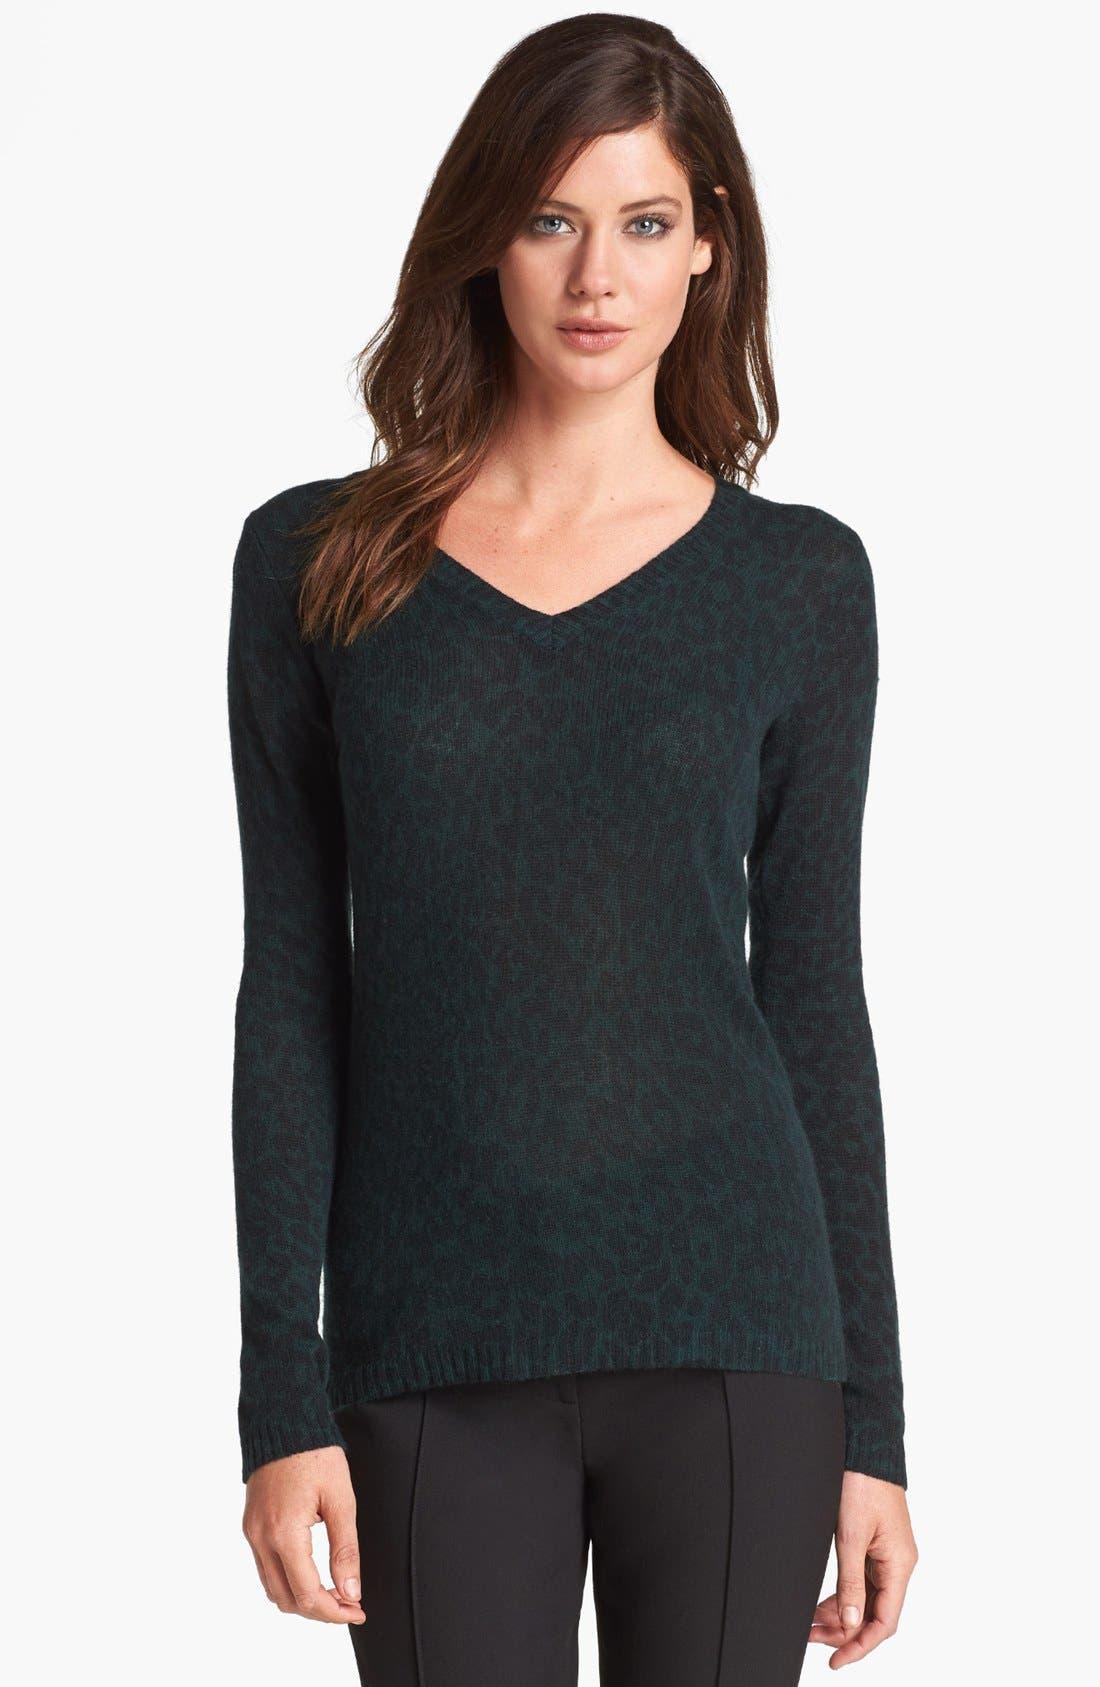 Main Image - White + Warren Print V-Neck Cashmere Sweater